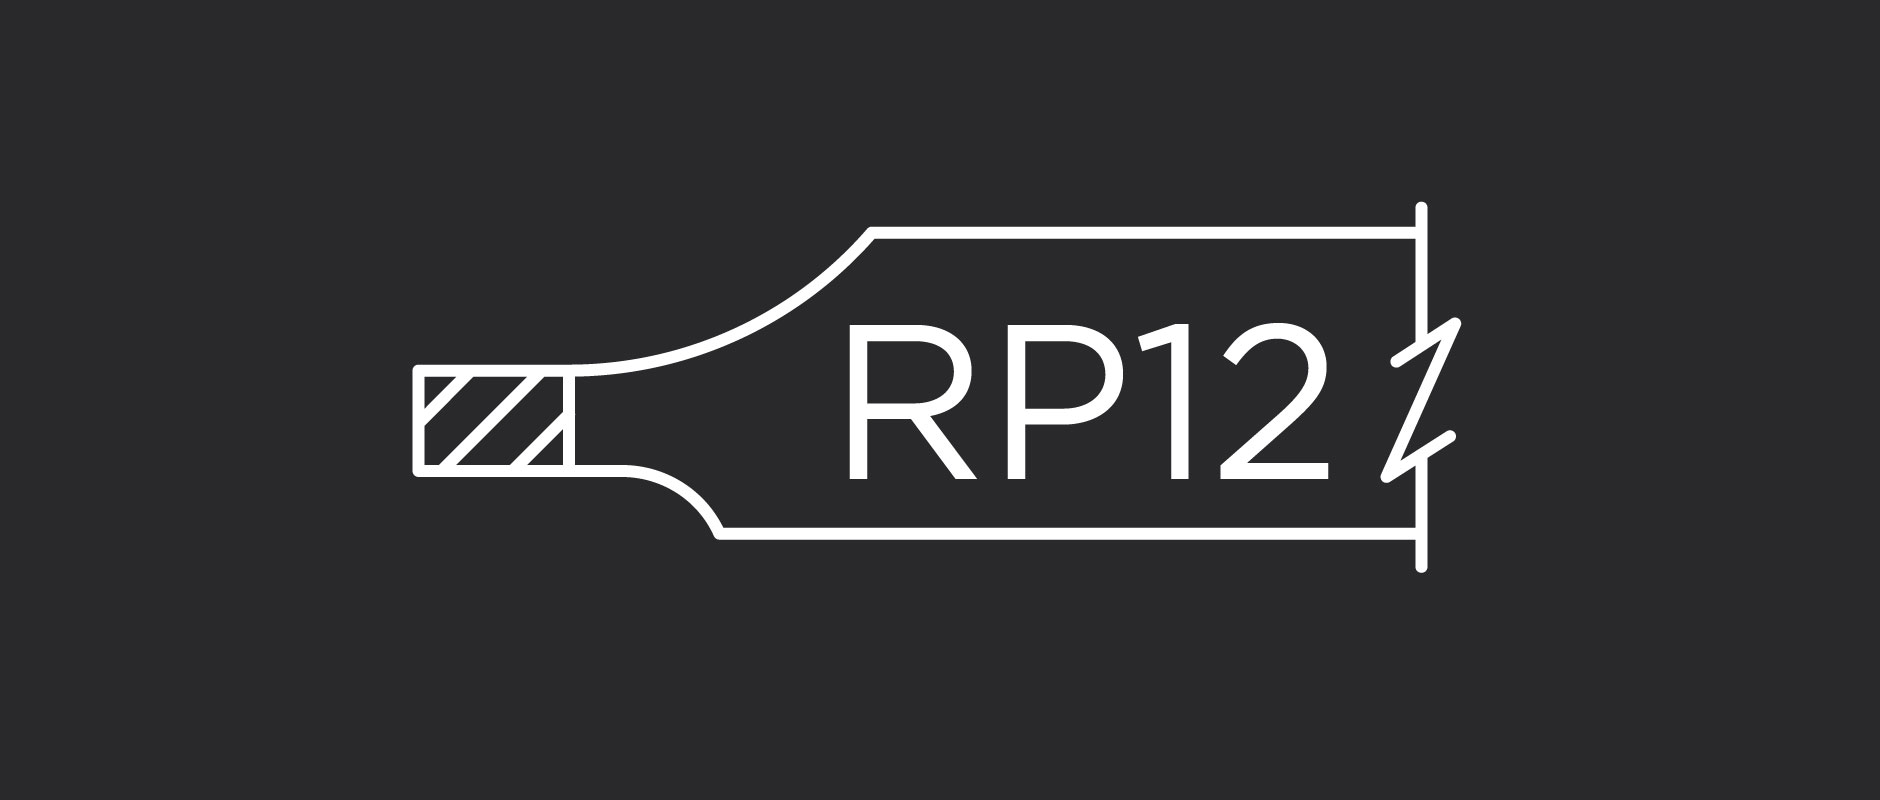 RP12 raised panel profile